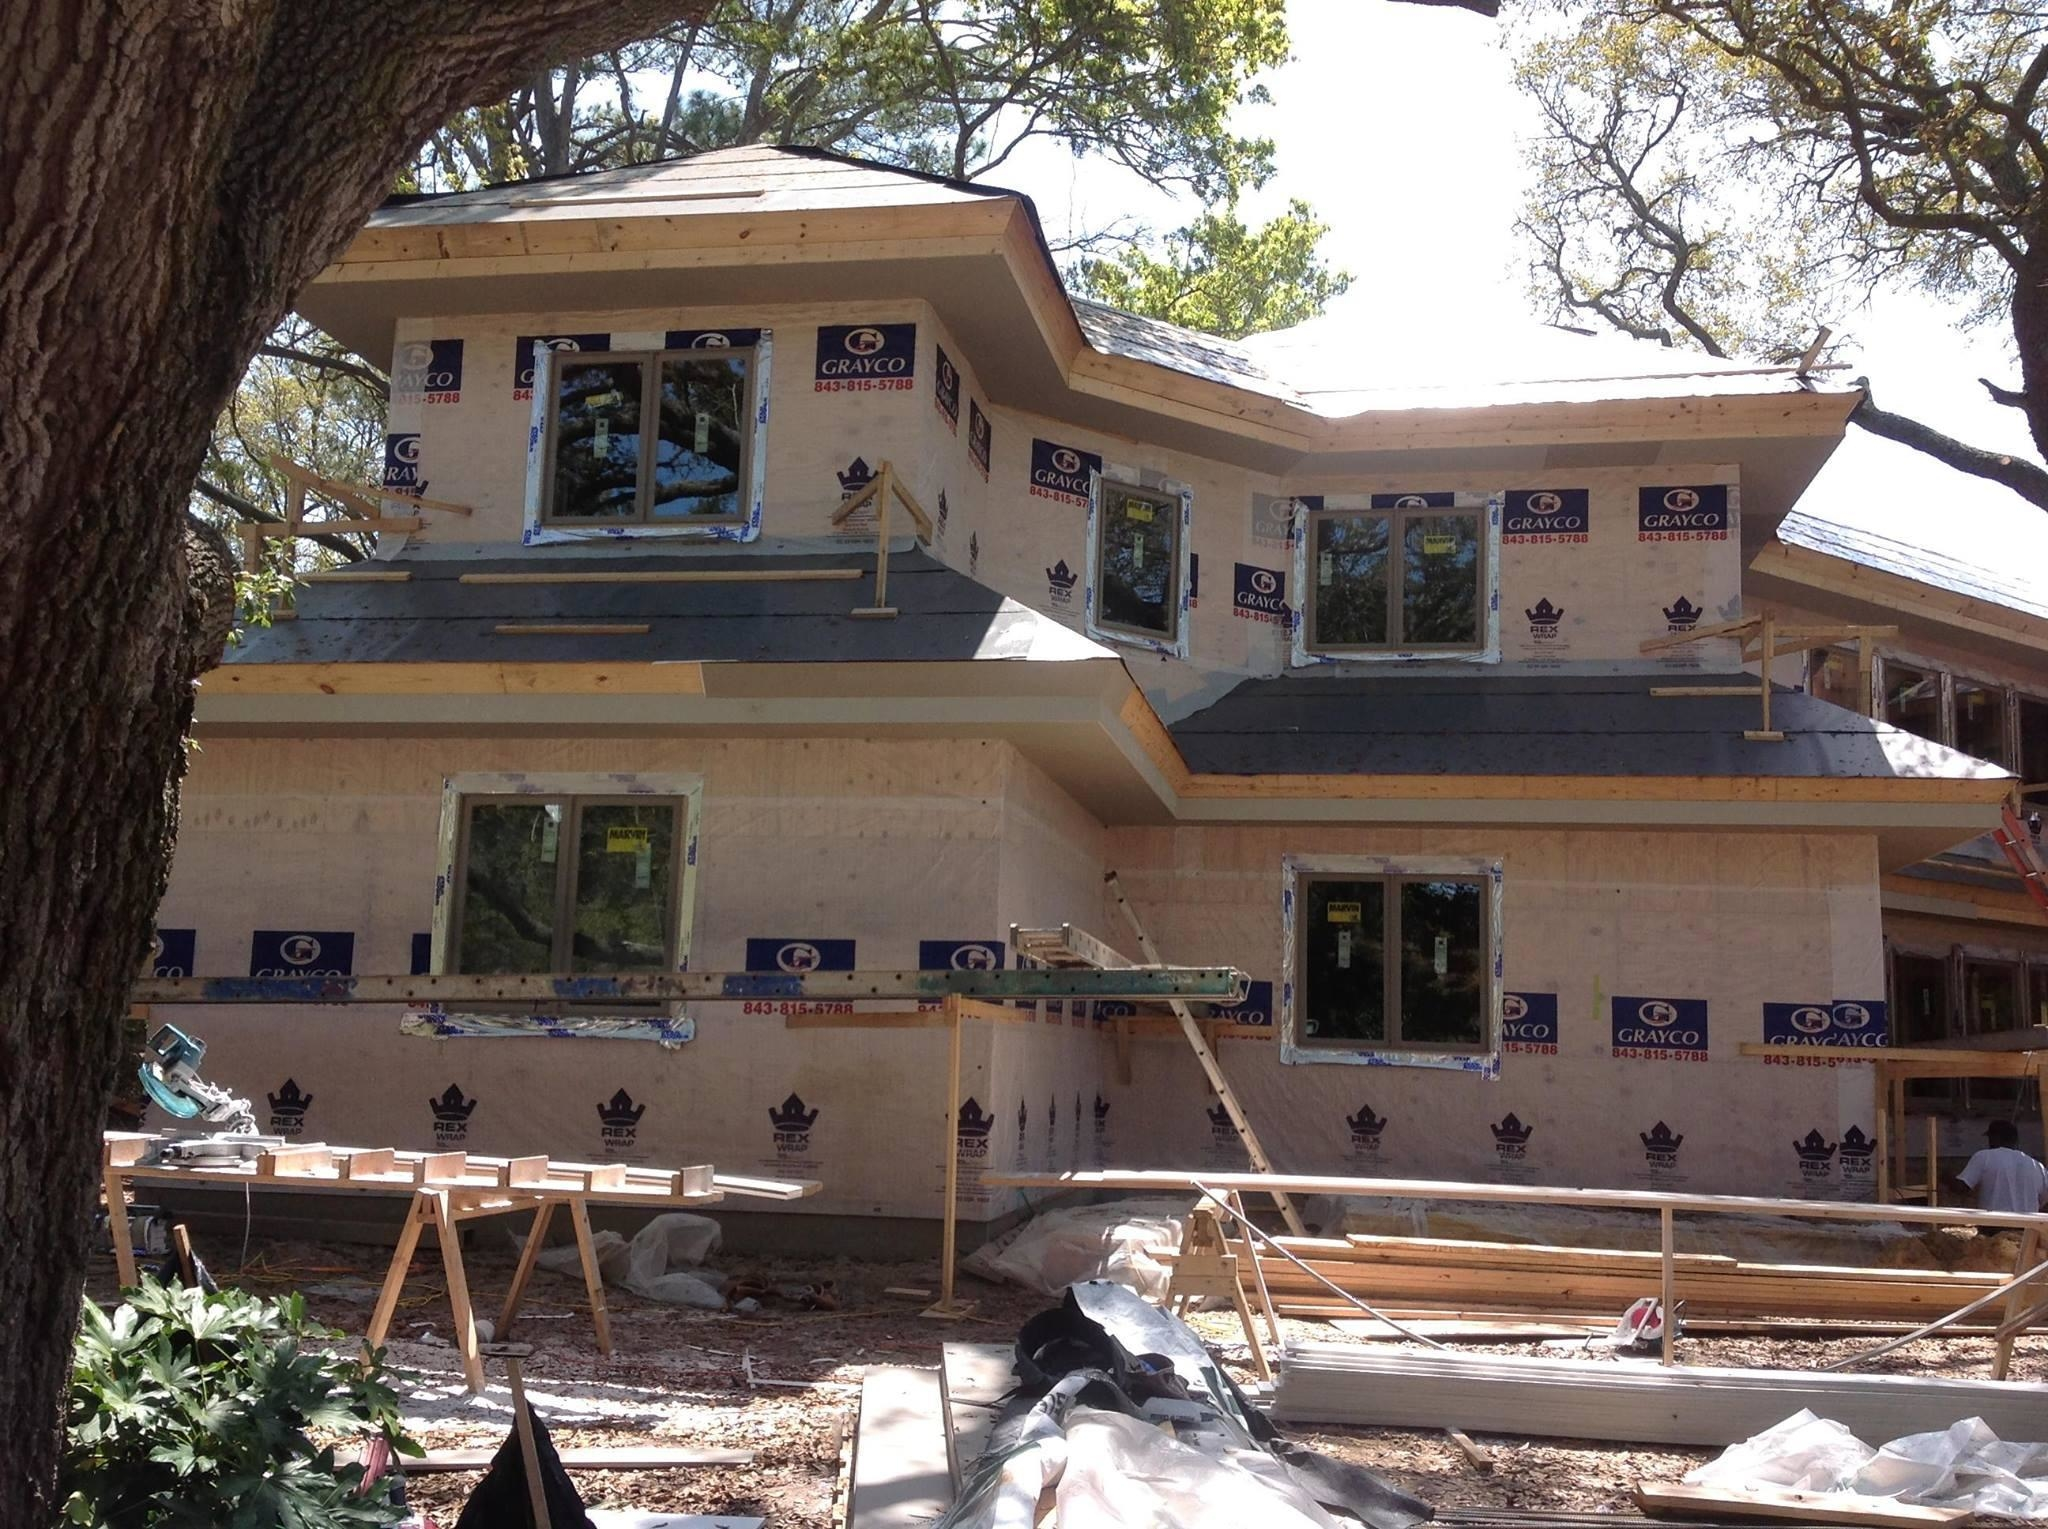 RoofCrafters-Savannah image 98